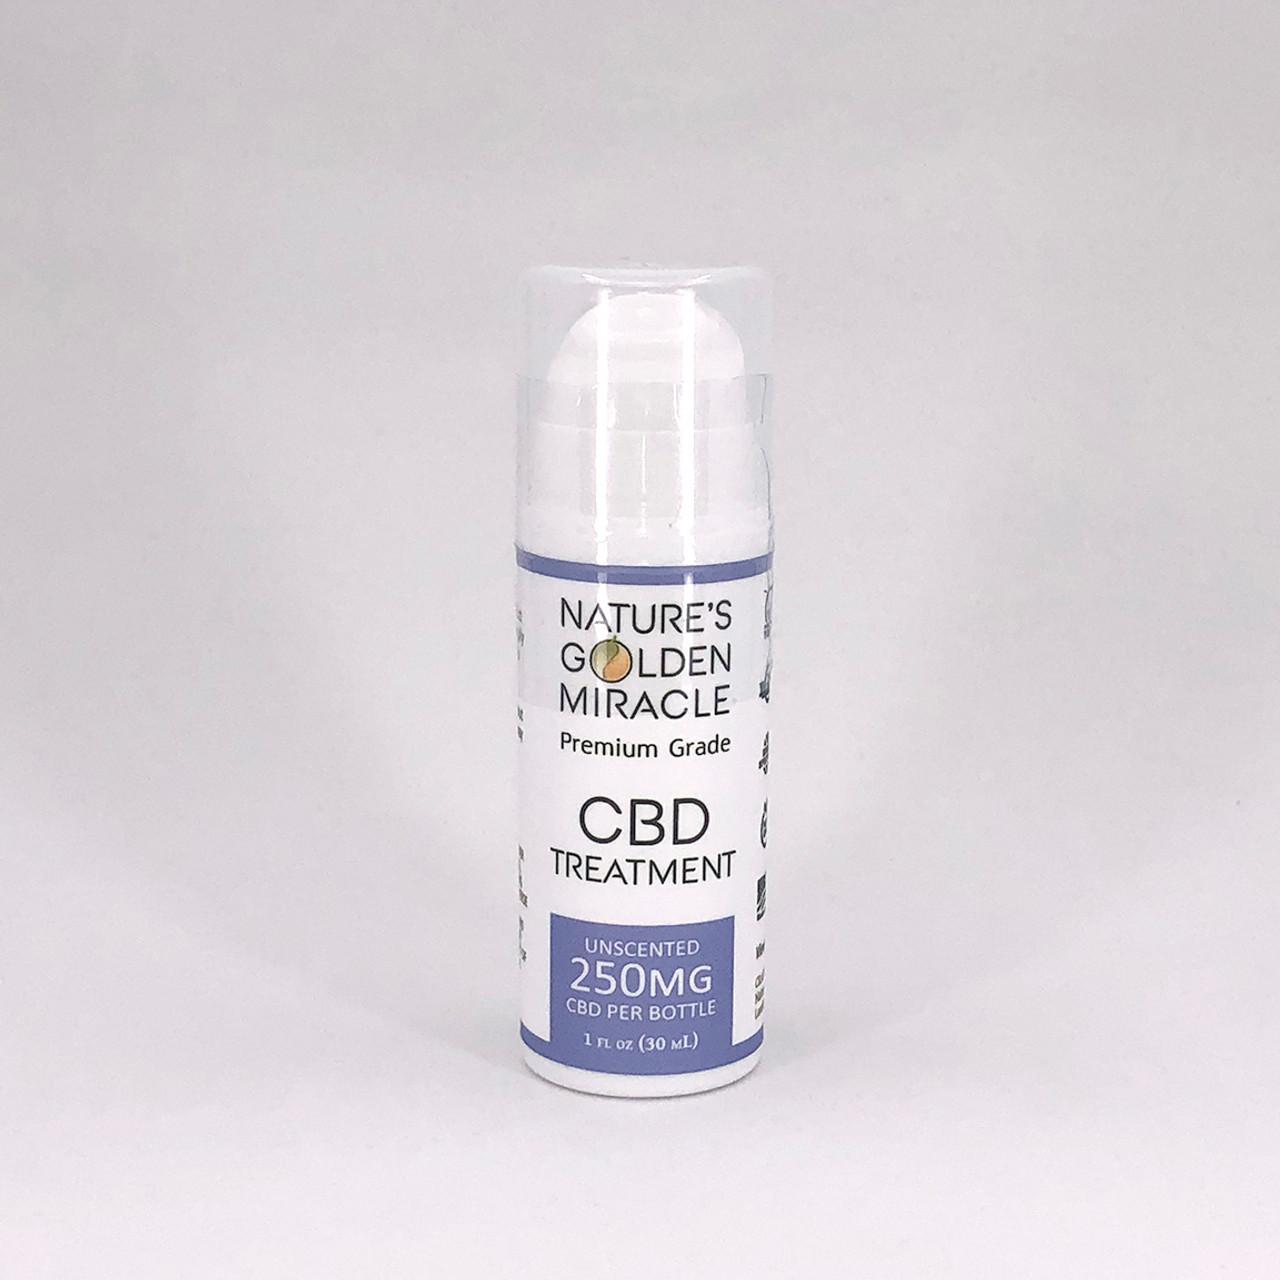 Premium Grade Broad Spectrum Hemp Extract CBD 250mg Ultimate Serum THC-Free